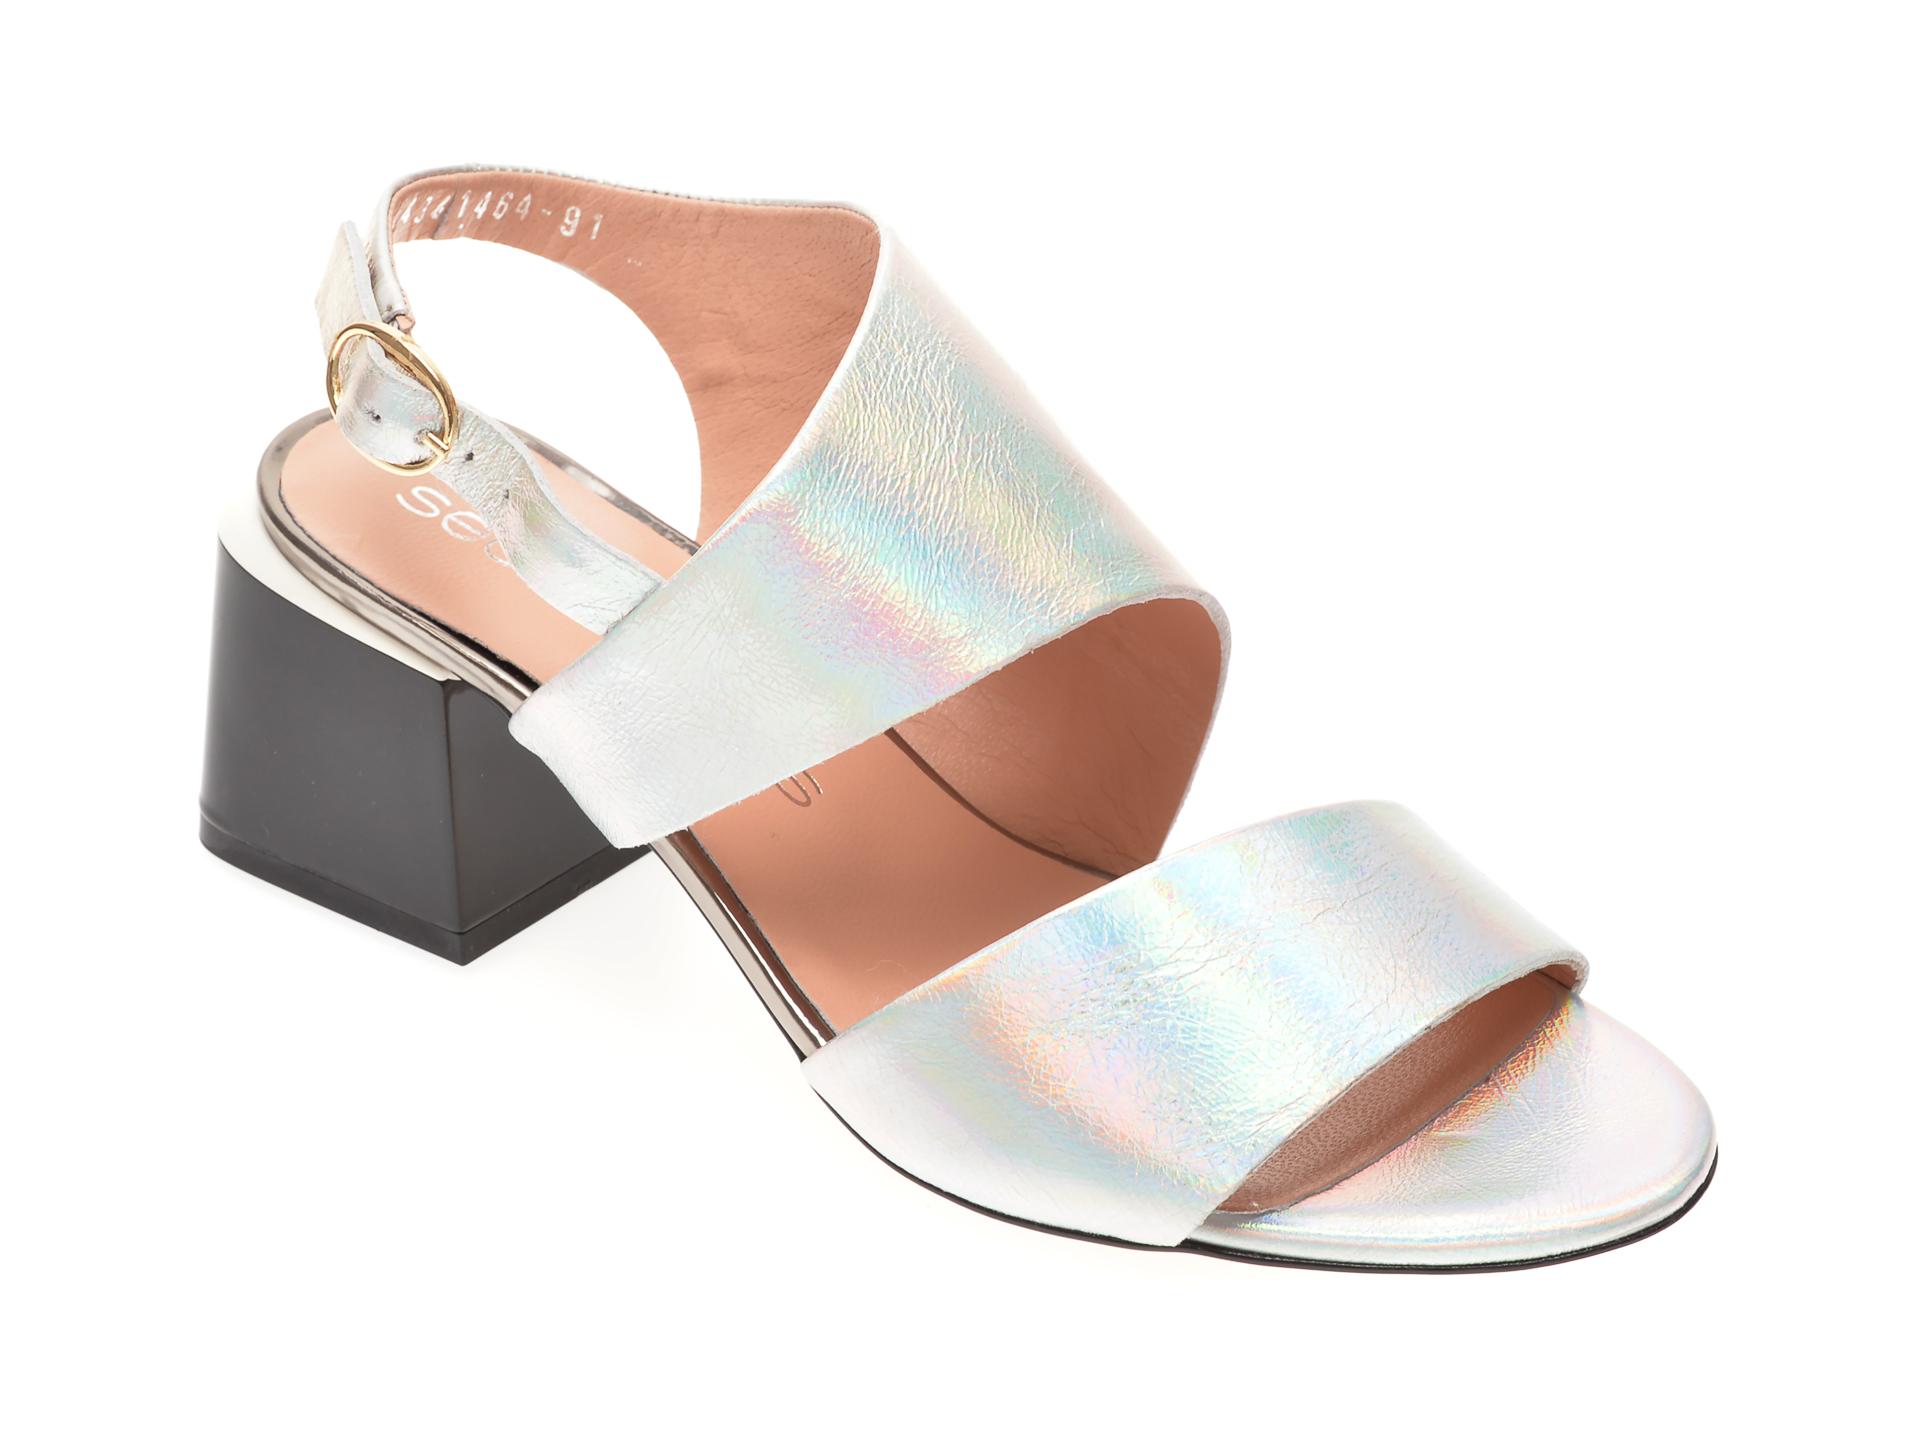 Sandale MISS LIZA argintii, 1182434, din piele naturala lacuita